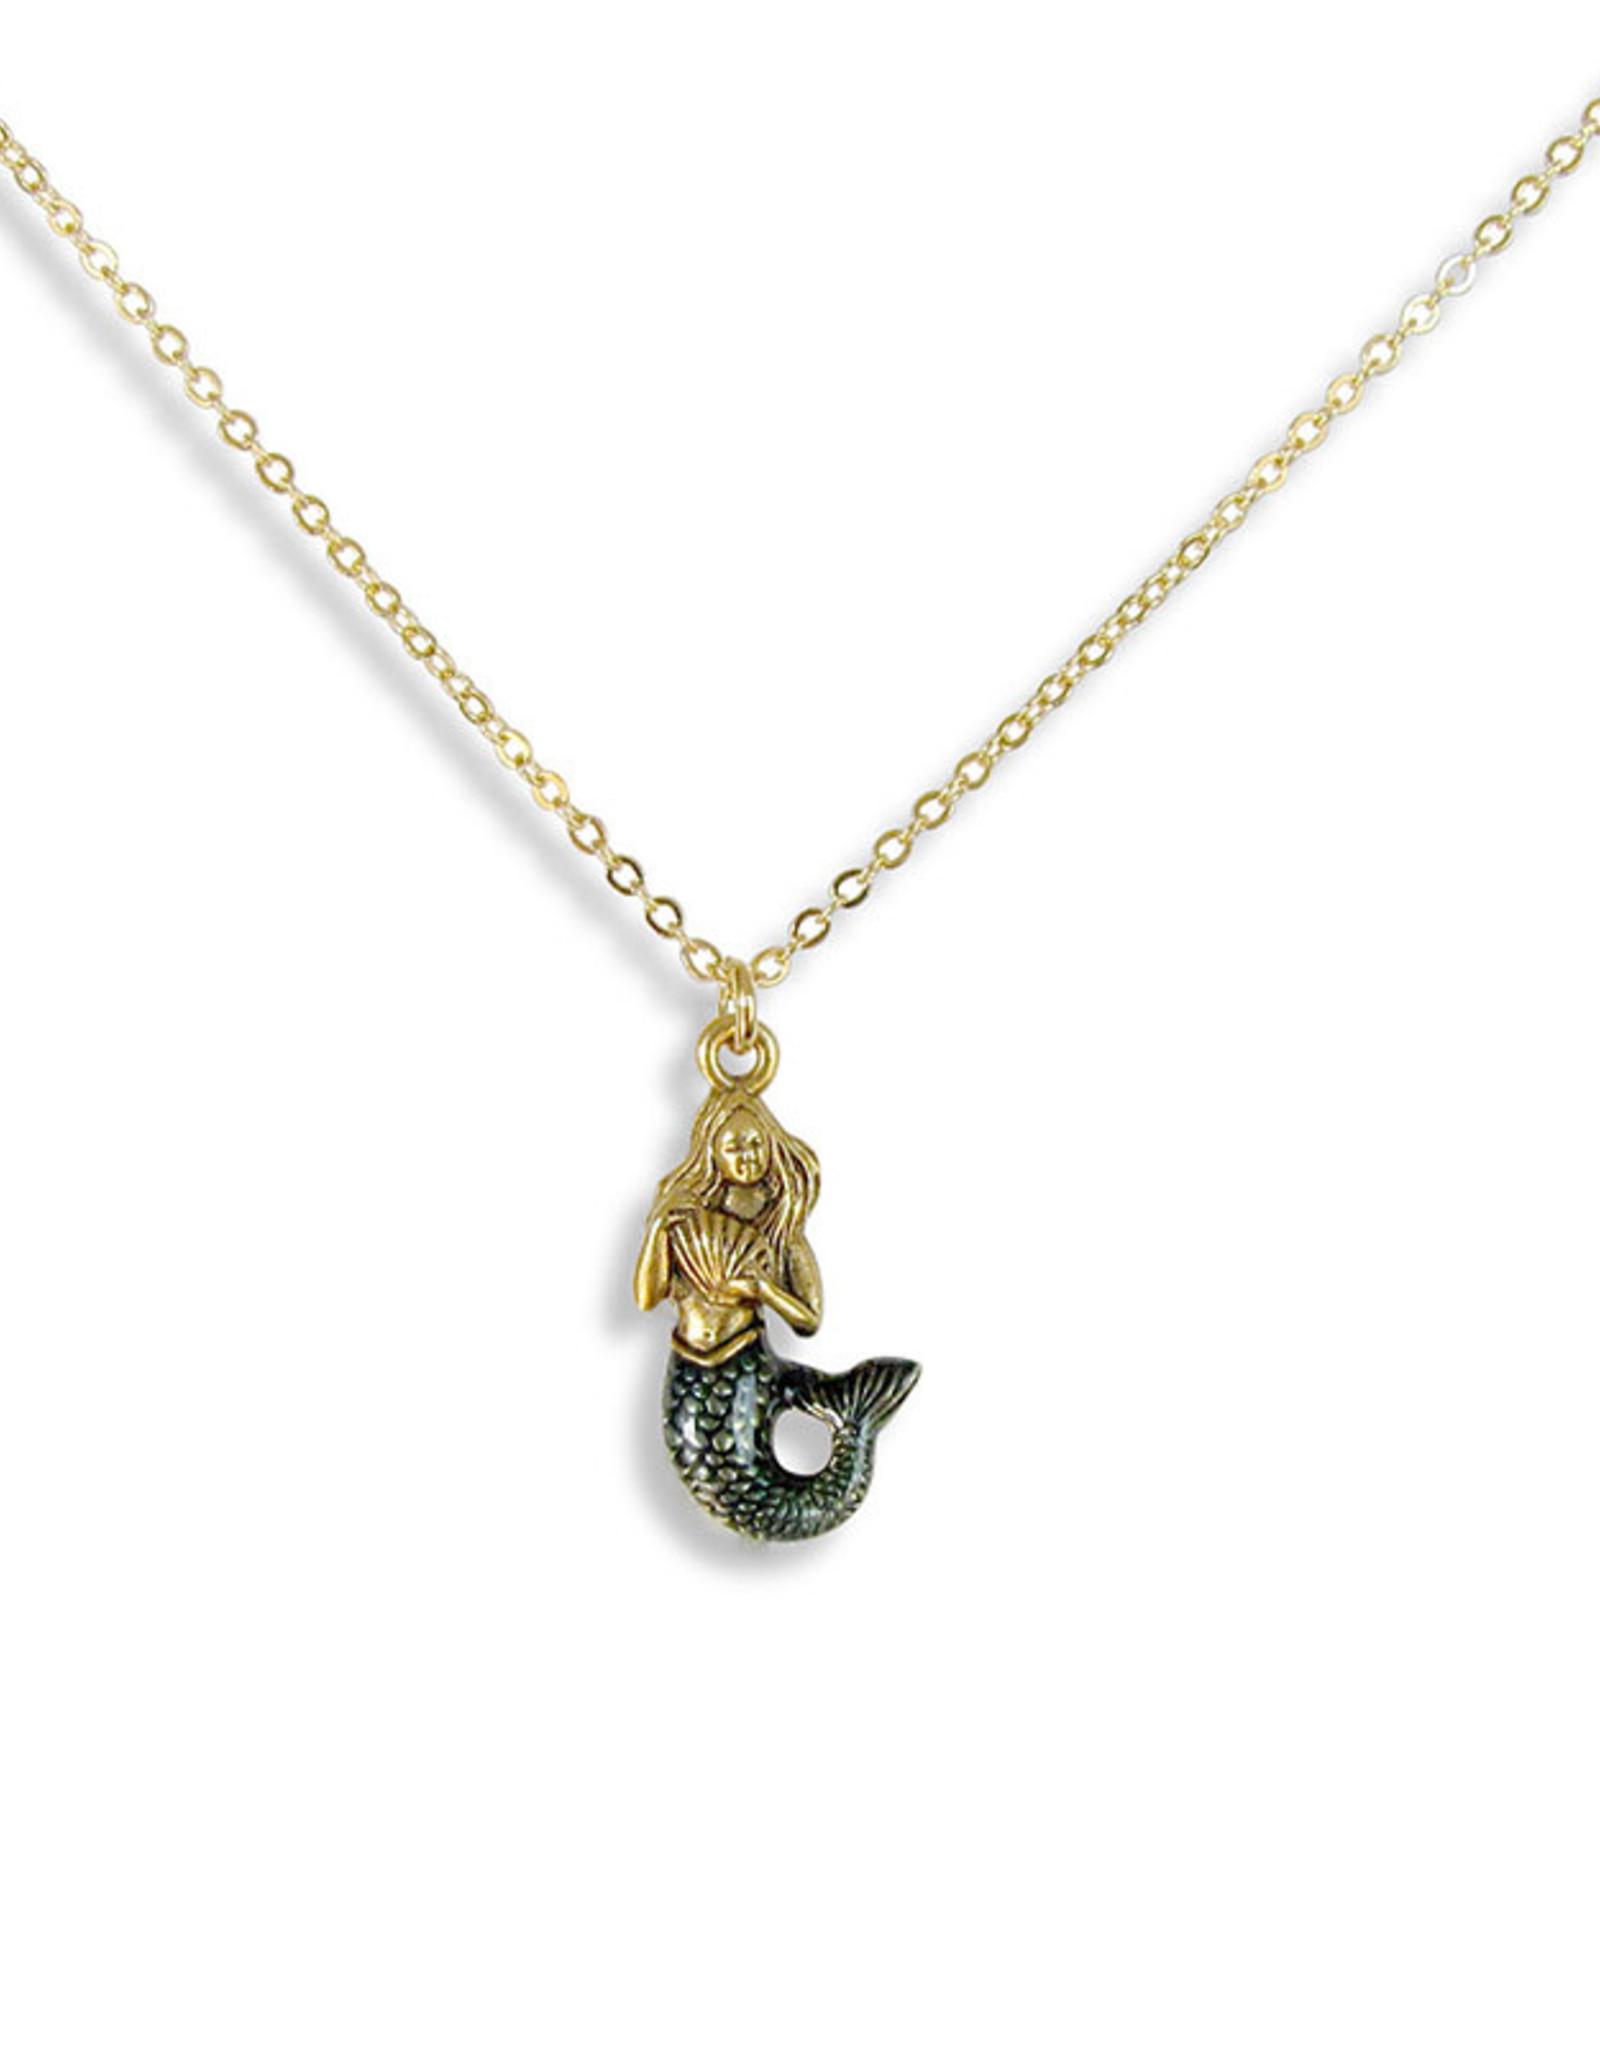 Ornamental Things Mermaid Necklace - Ornamental Things